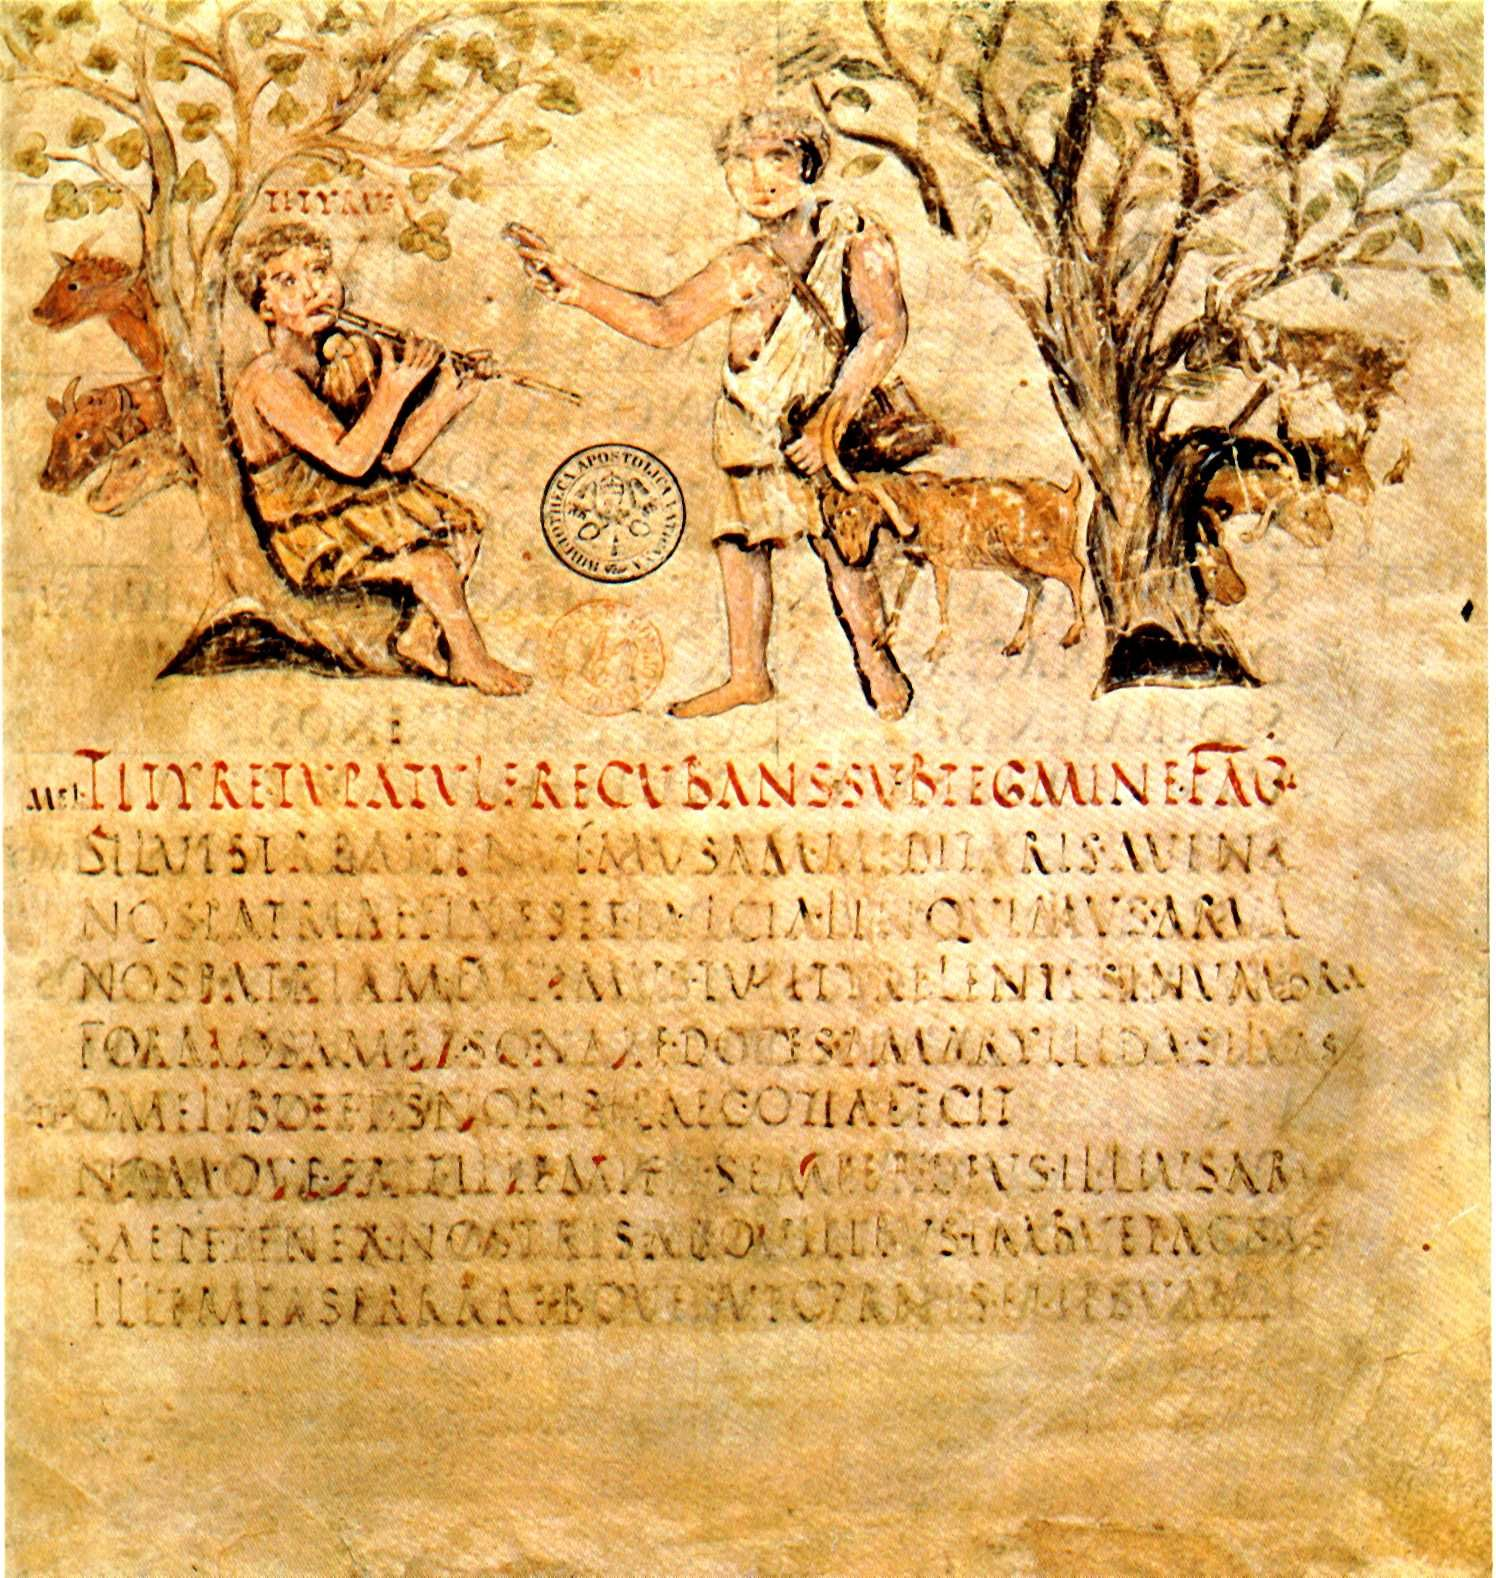 Ancient Medieval Literature: A Reading List Of Roman Classics